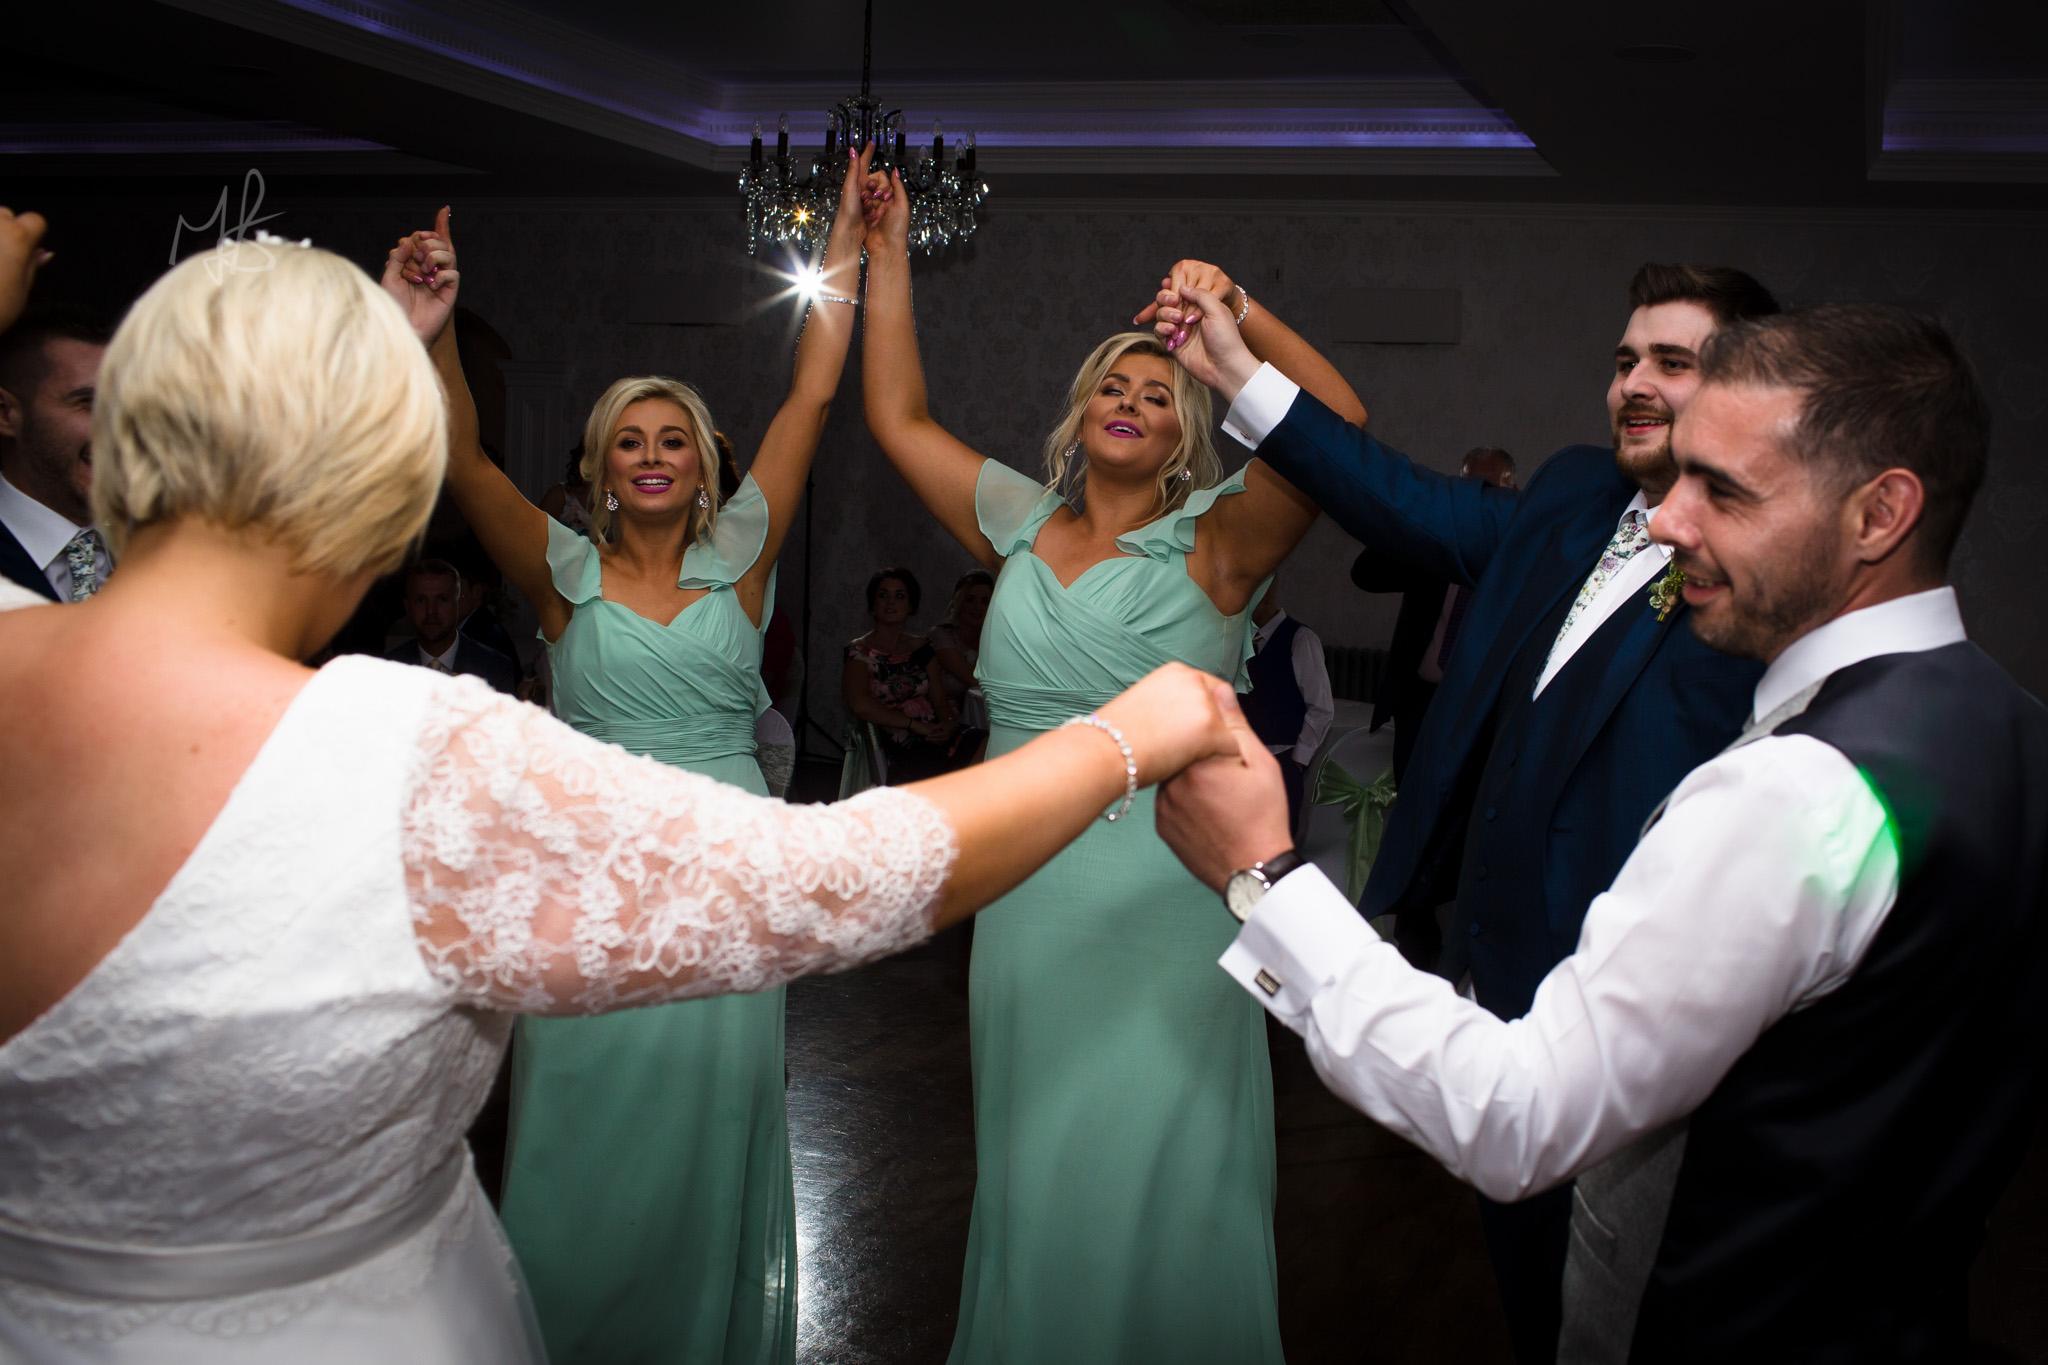 Northern-Ireland-Wedding-Photographer-Mark-Barnes-Ballymena_wedding-photography-Leighinmohr-House-Seamas_Alanna_For-web-57.jpg